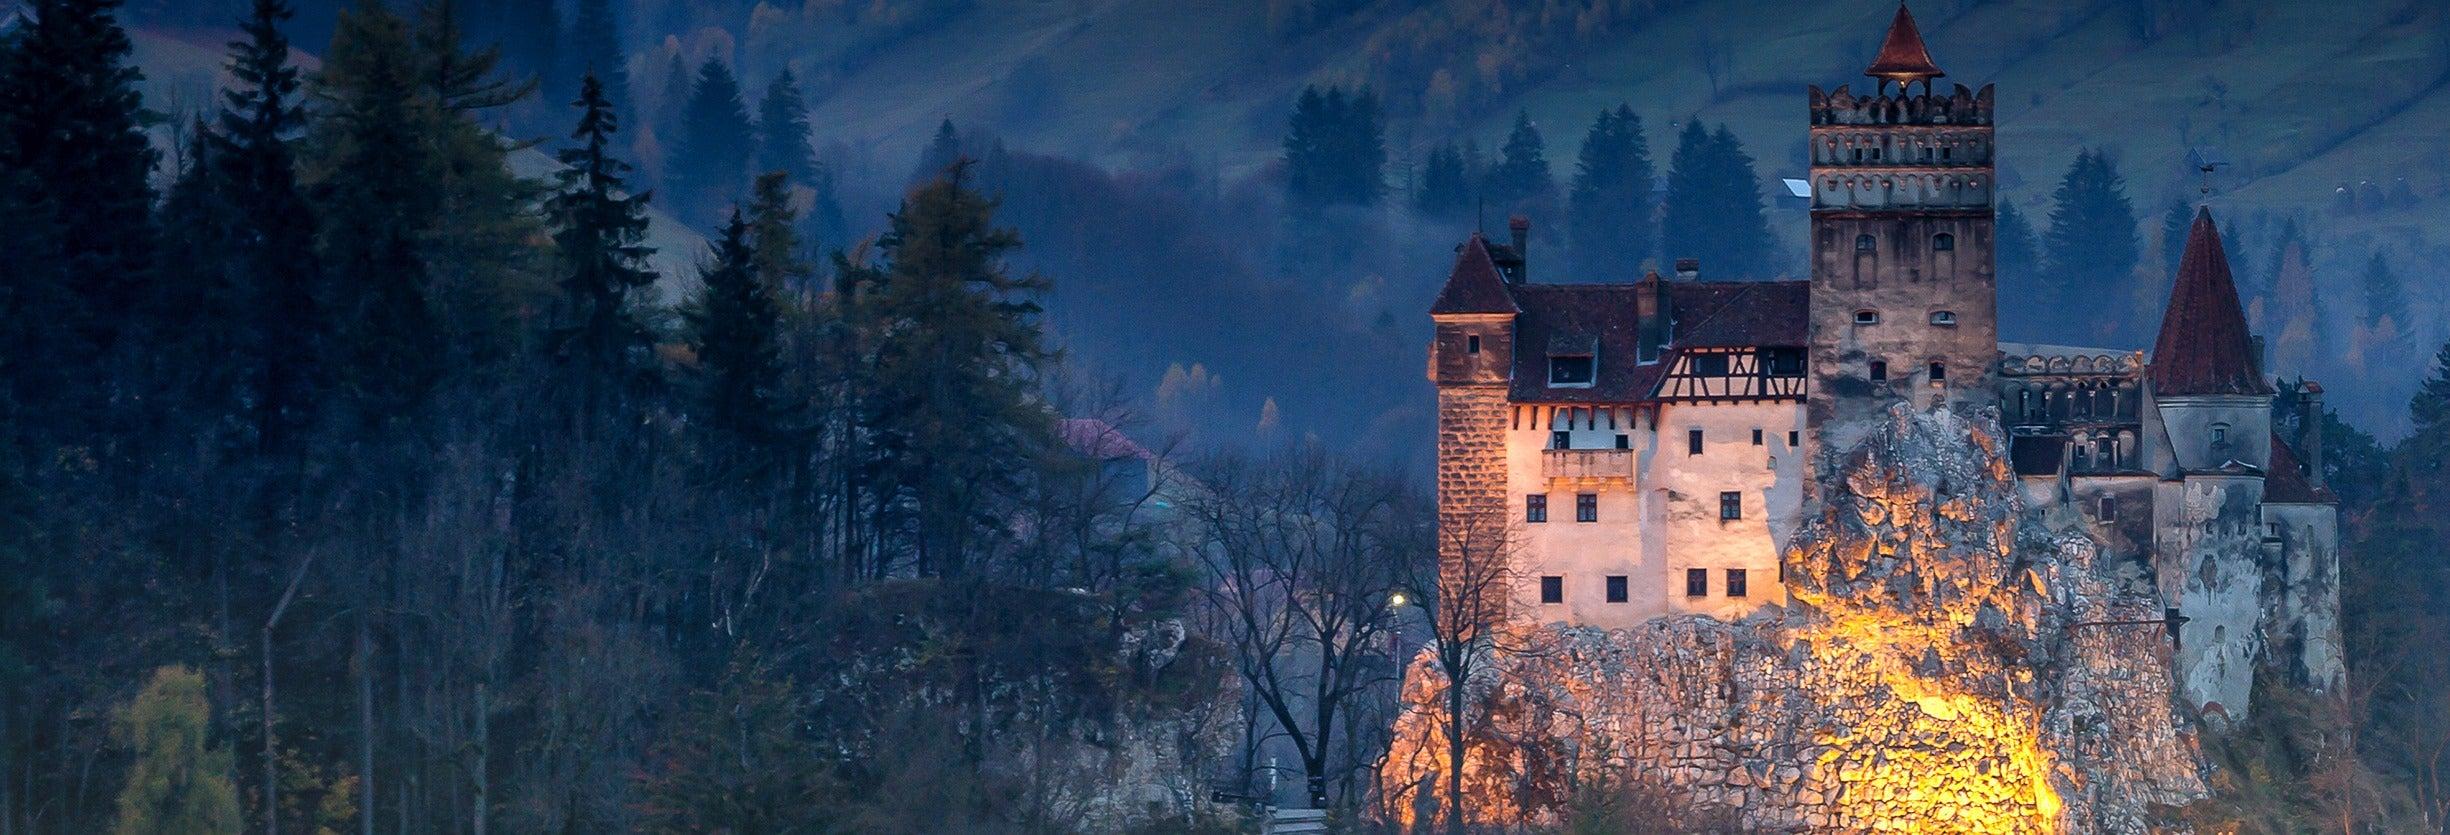 Transylvania 2 Day Tour + Dracula's Castle Halloween Party